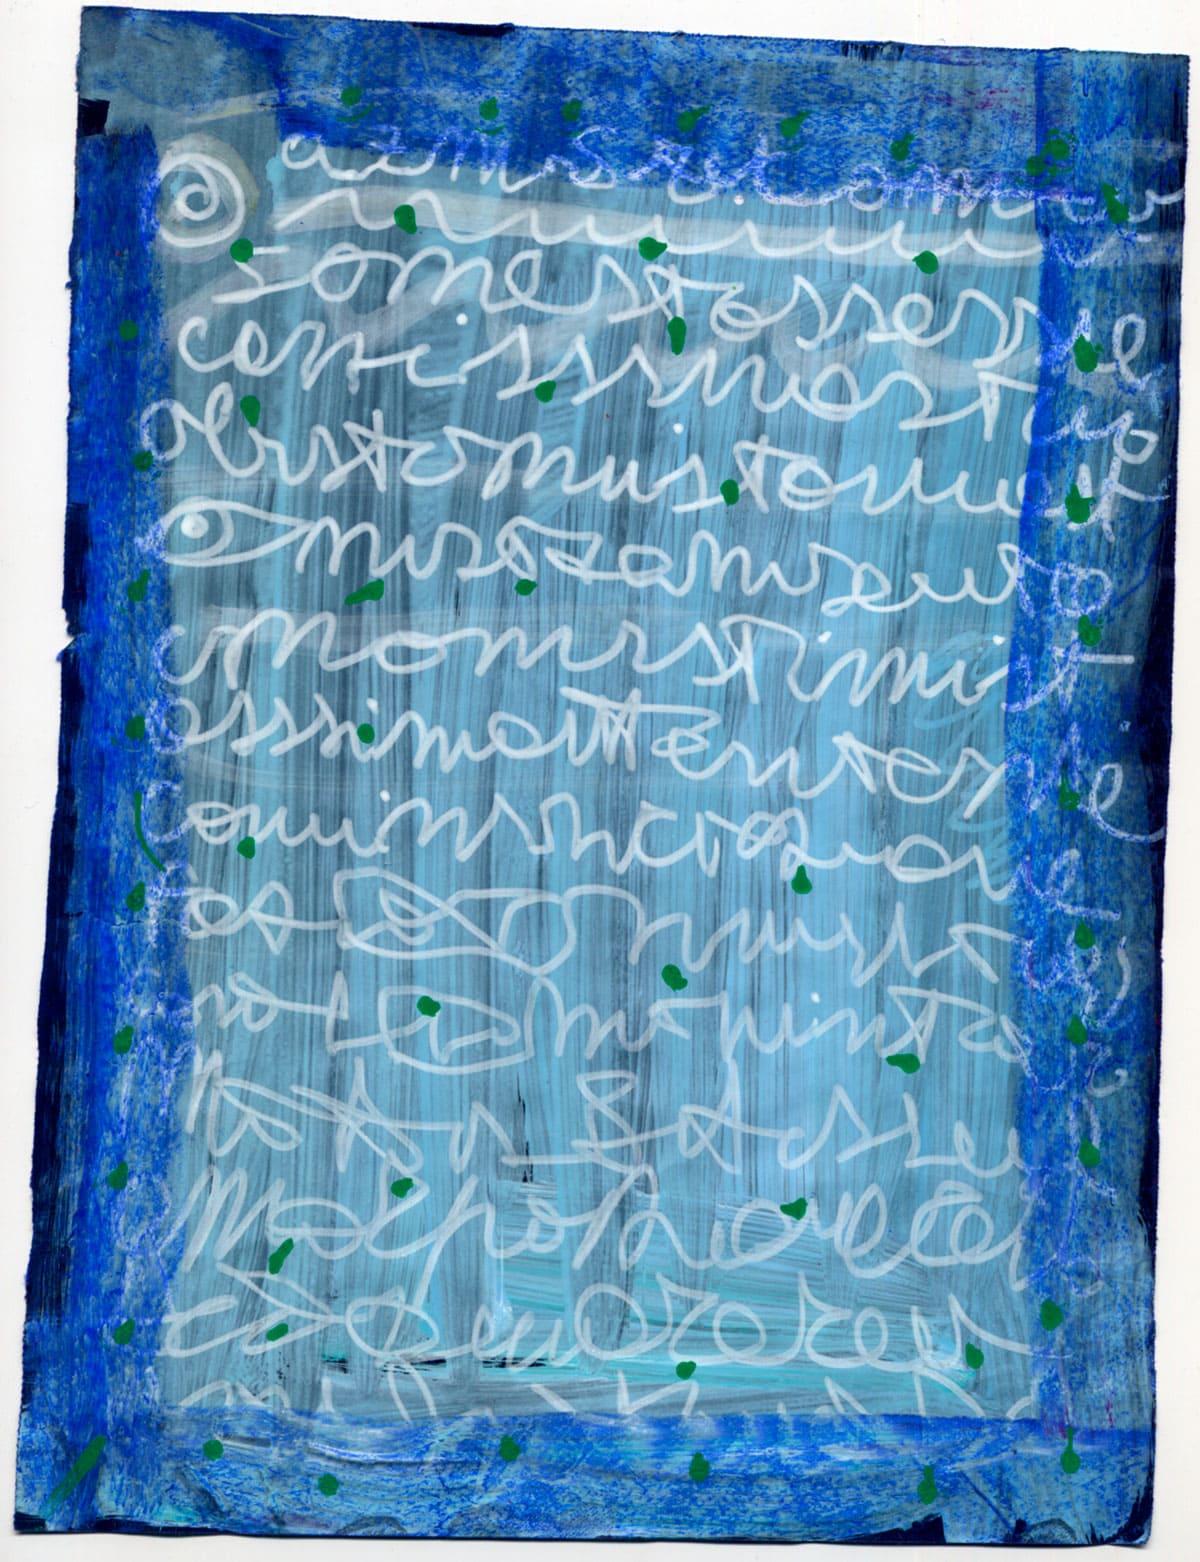 bonifacci-mastai-bibliografia